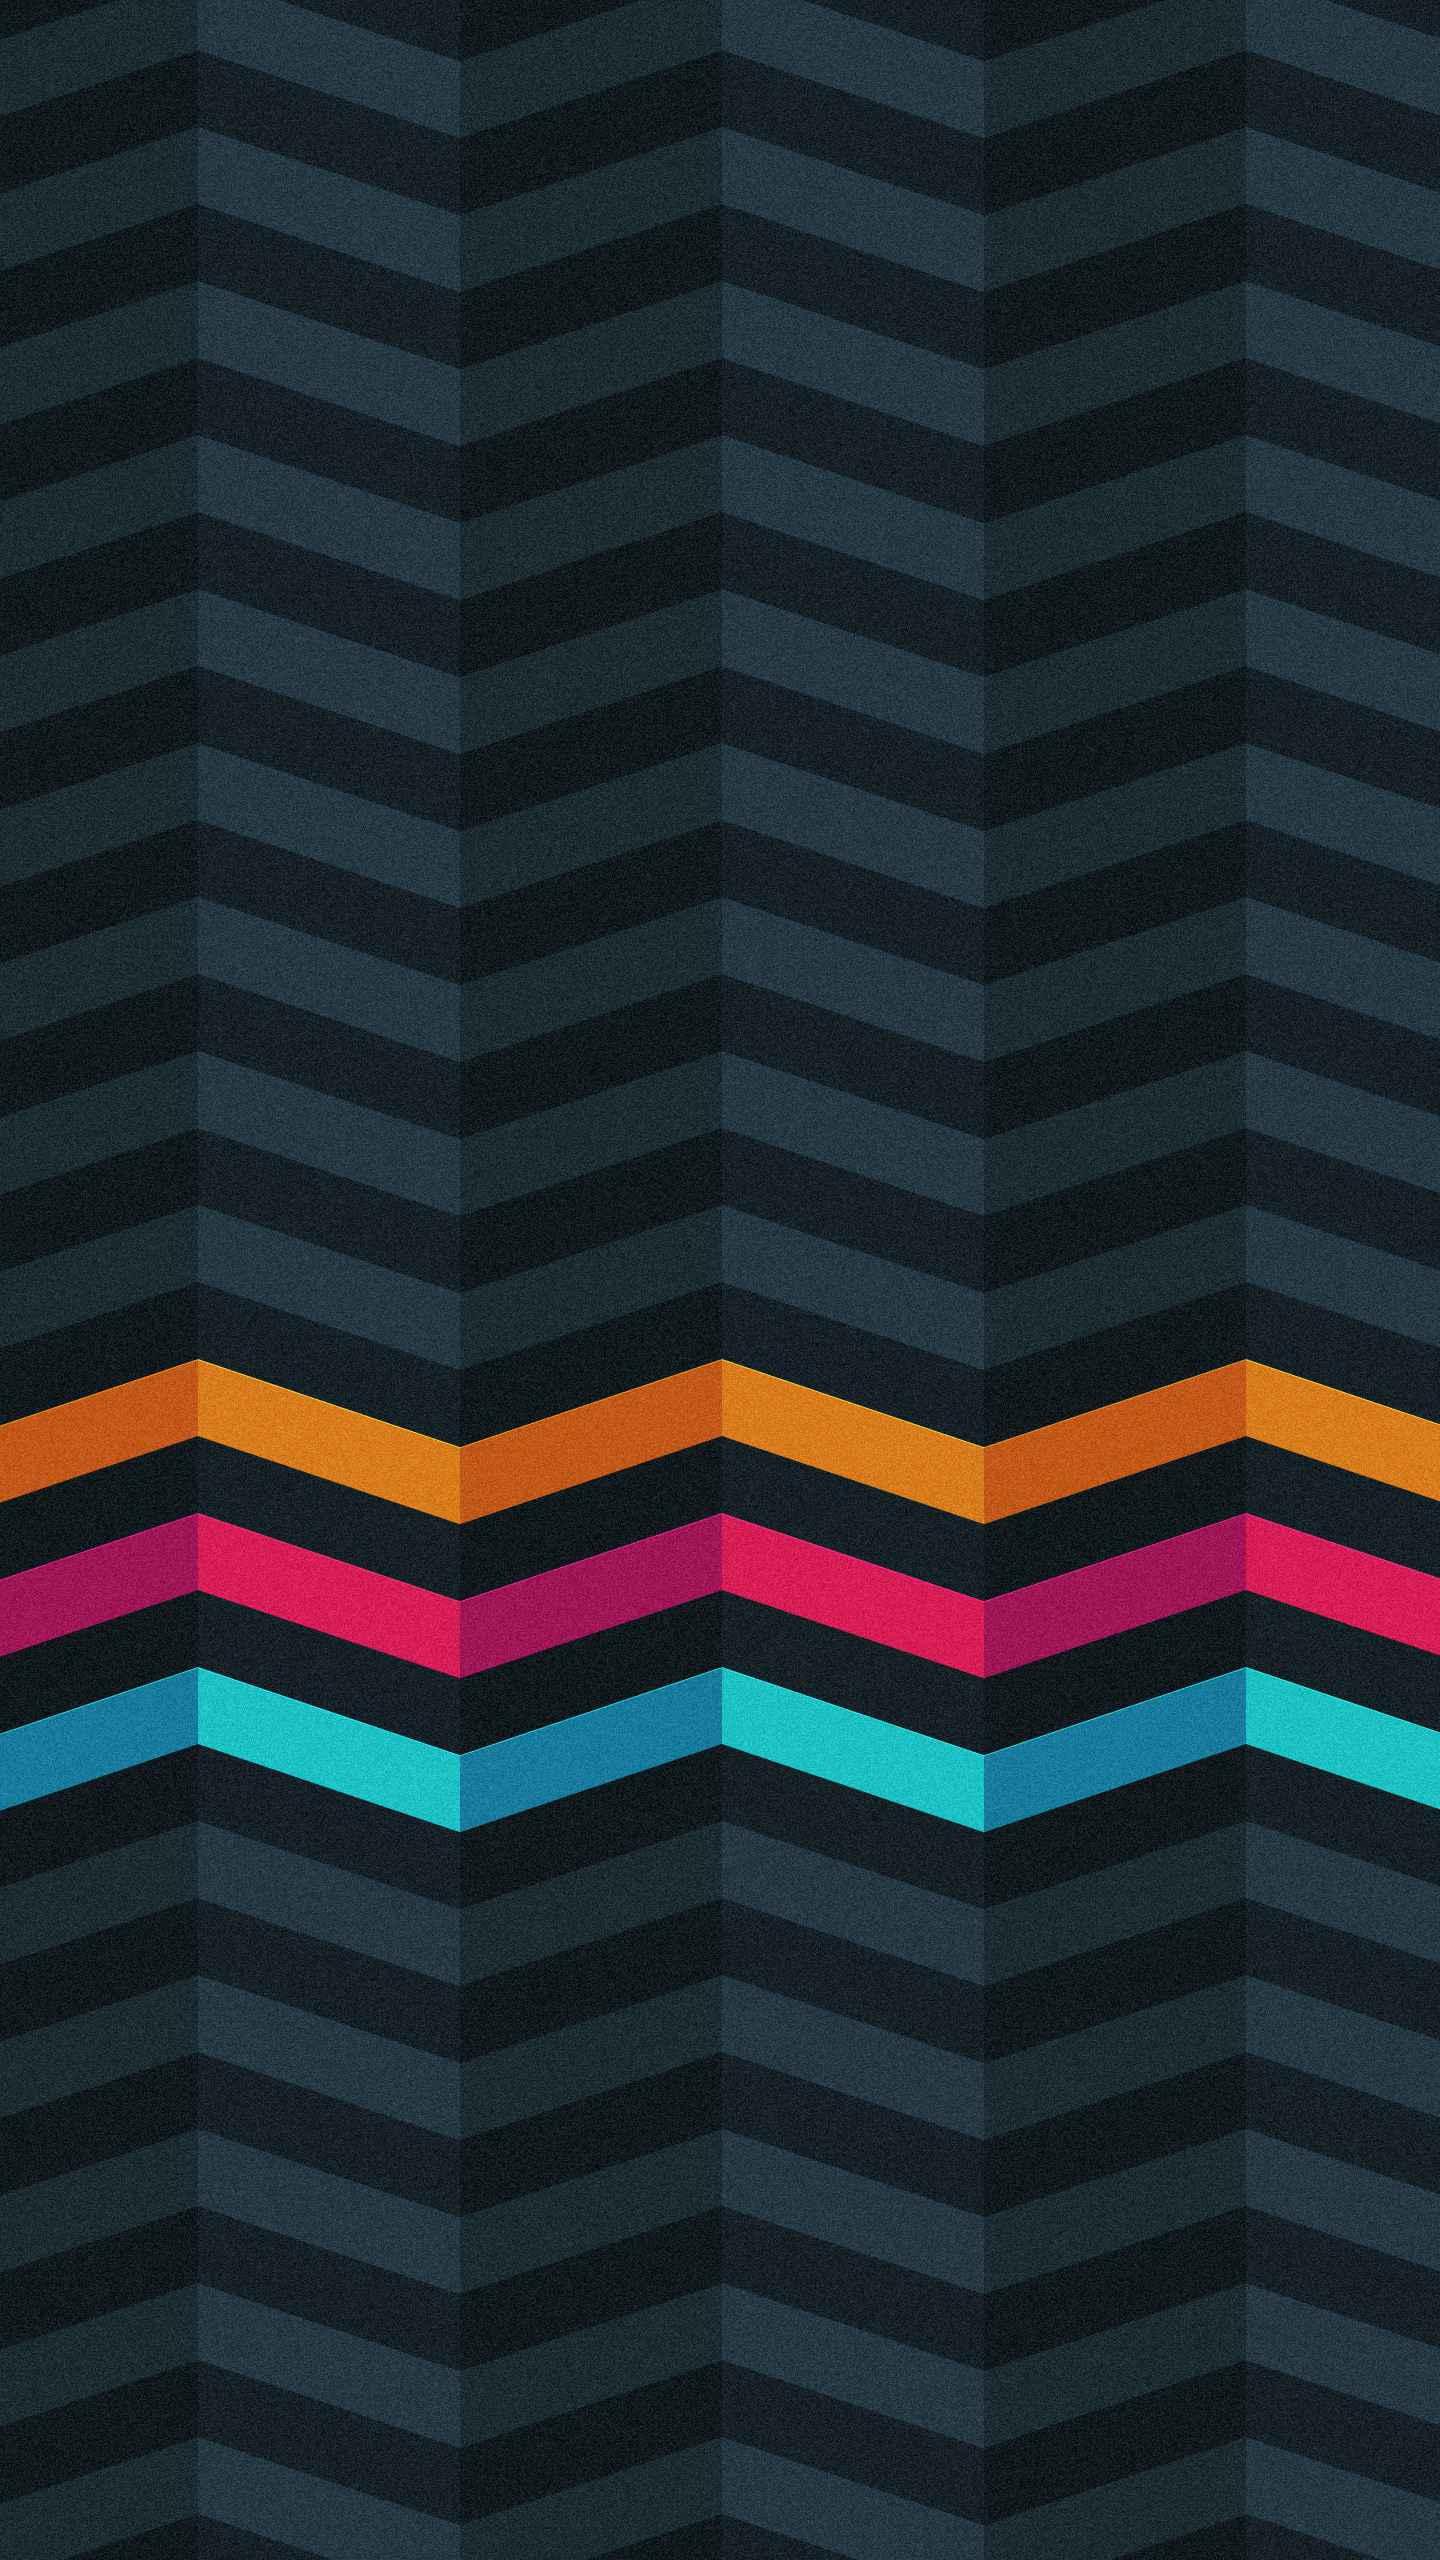 Escalation iPhone Wallpaper